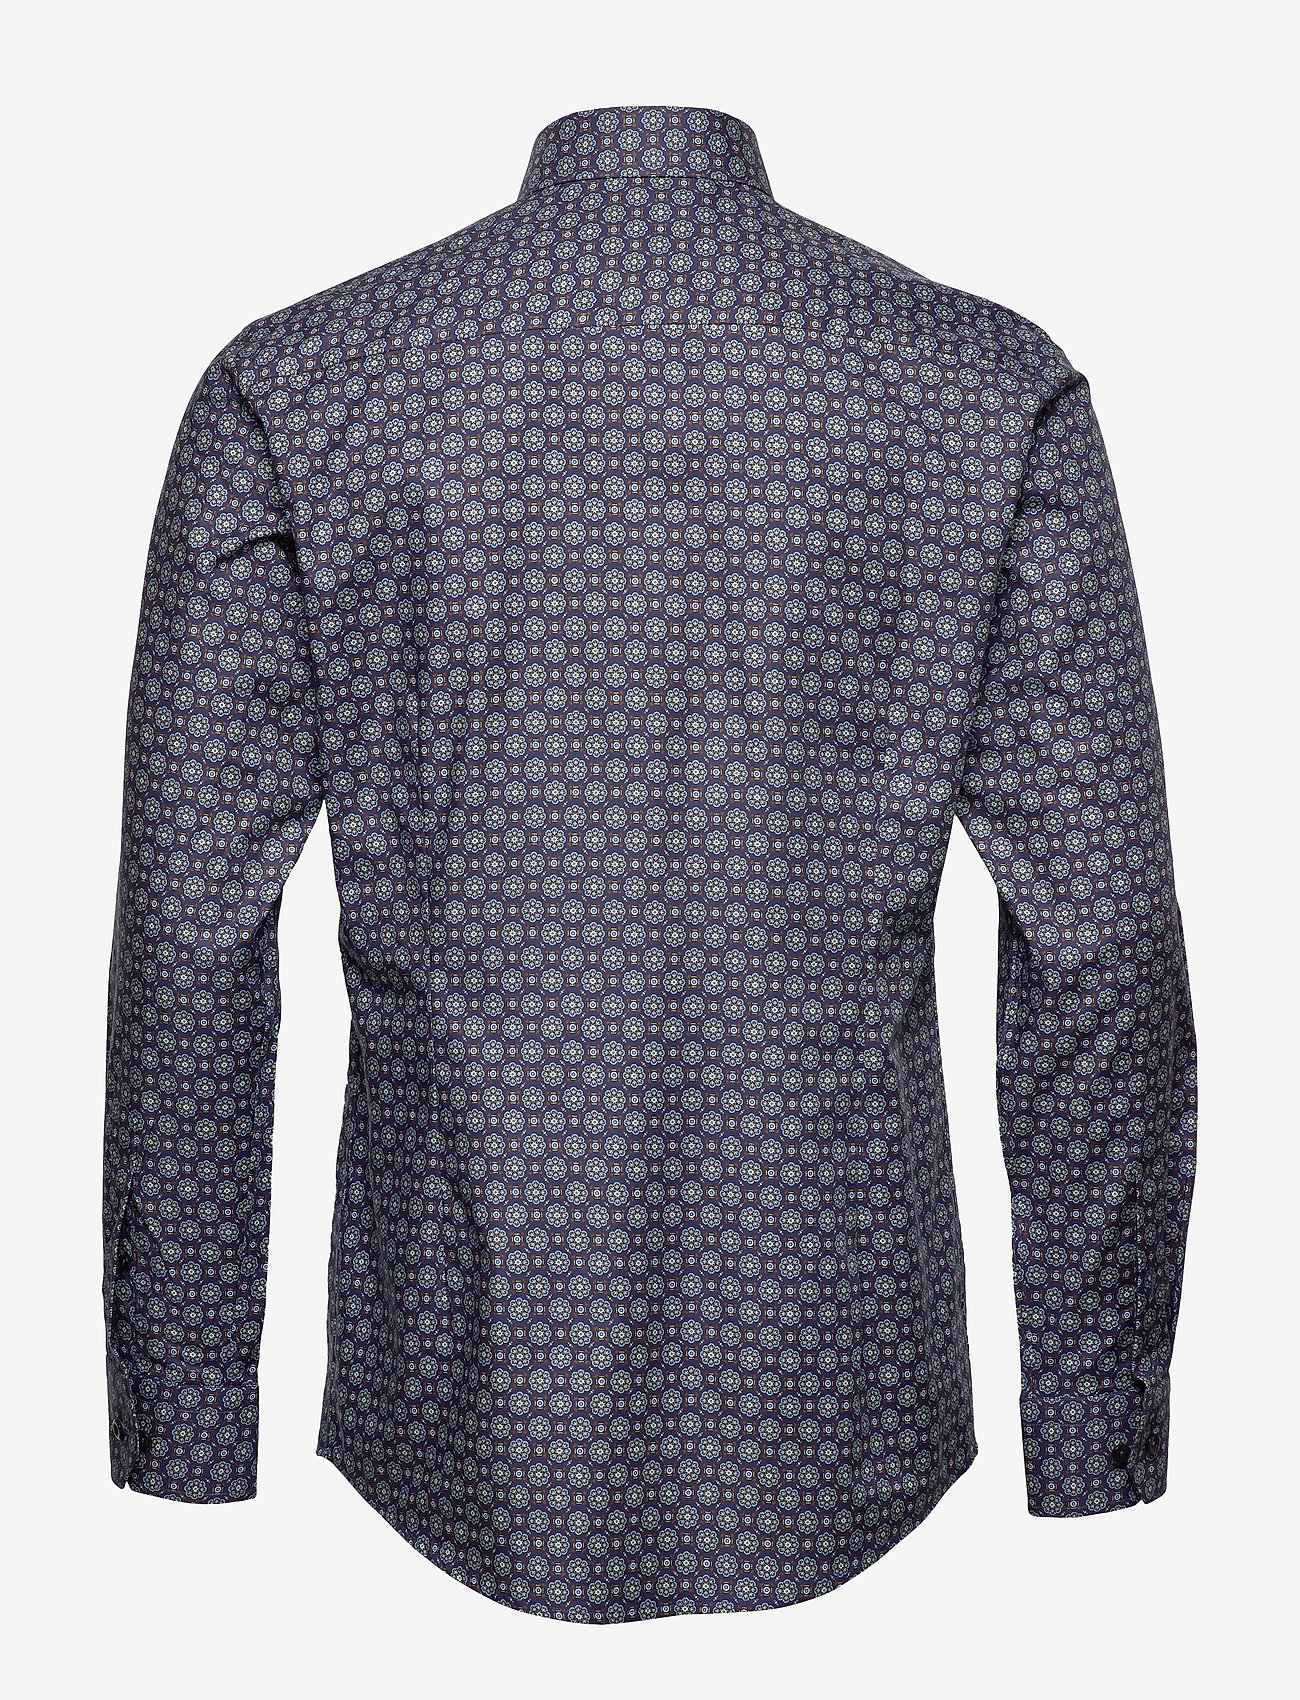 Navy Medallion Print Twill Shirt (Blue) - Eton 6cUKEs